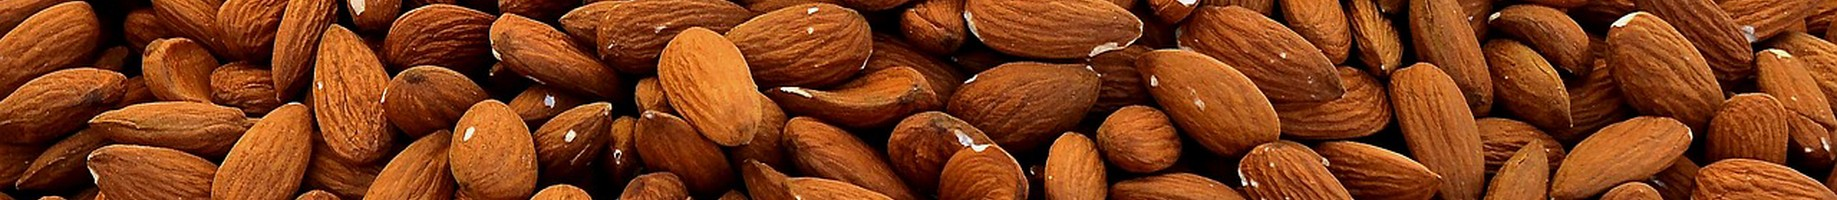 almonds-1571810_1280